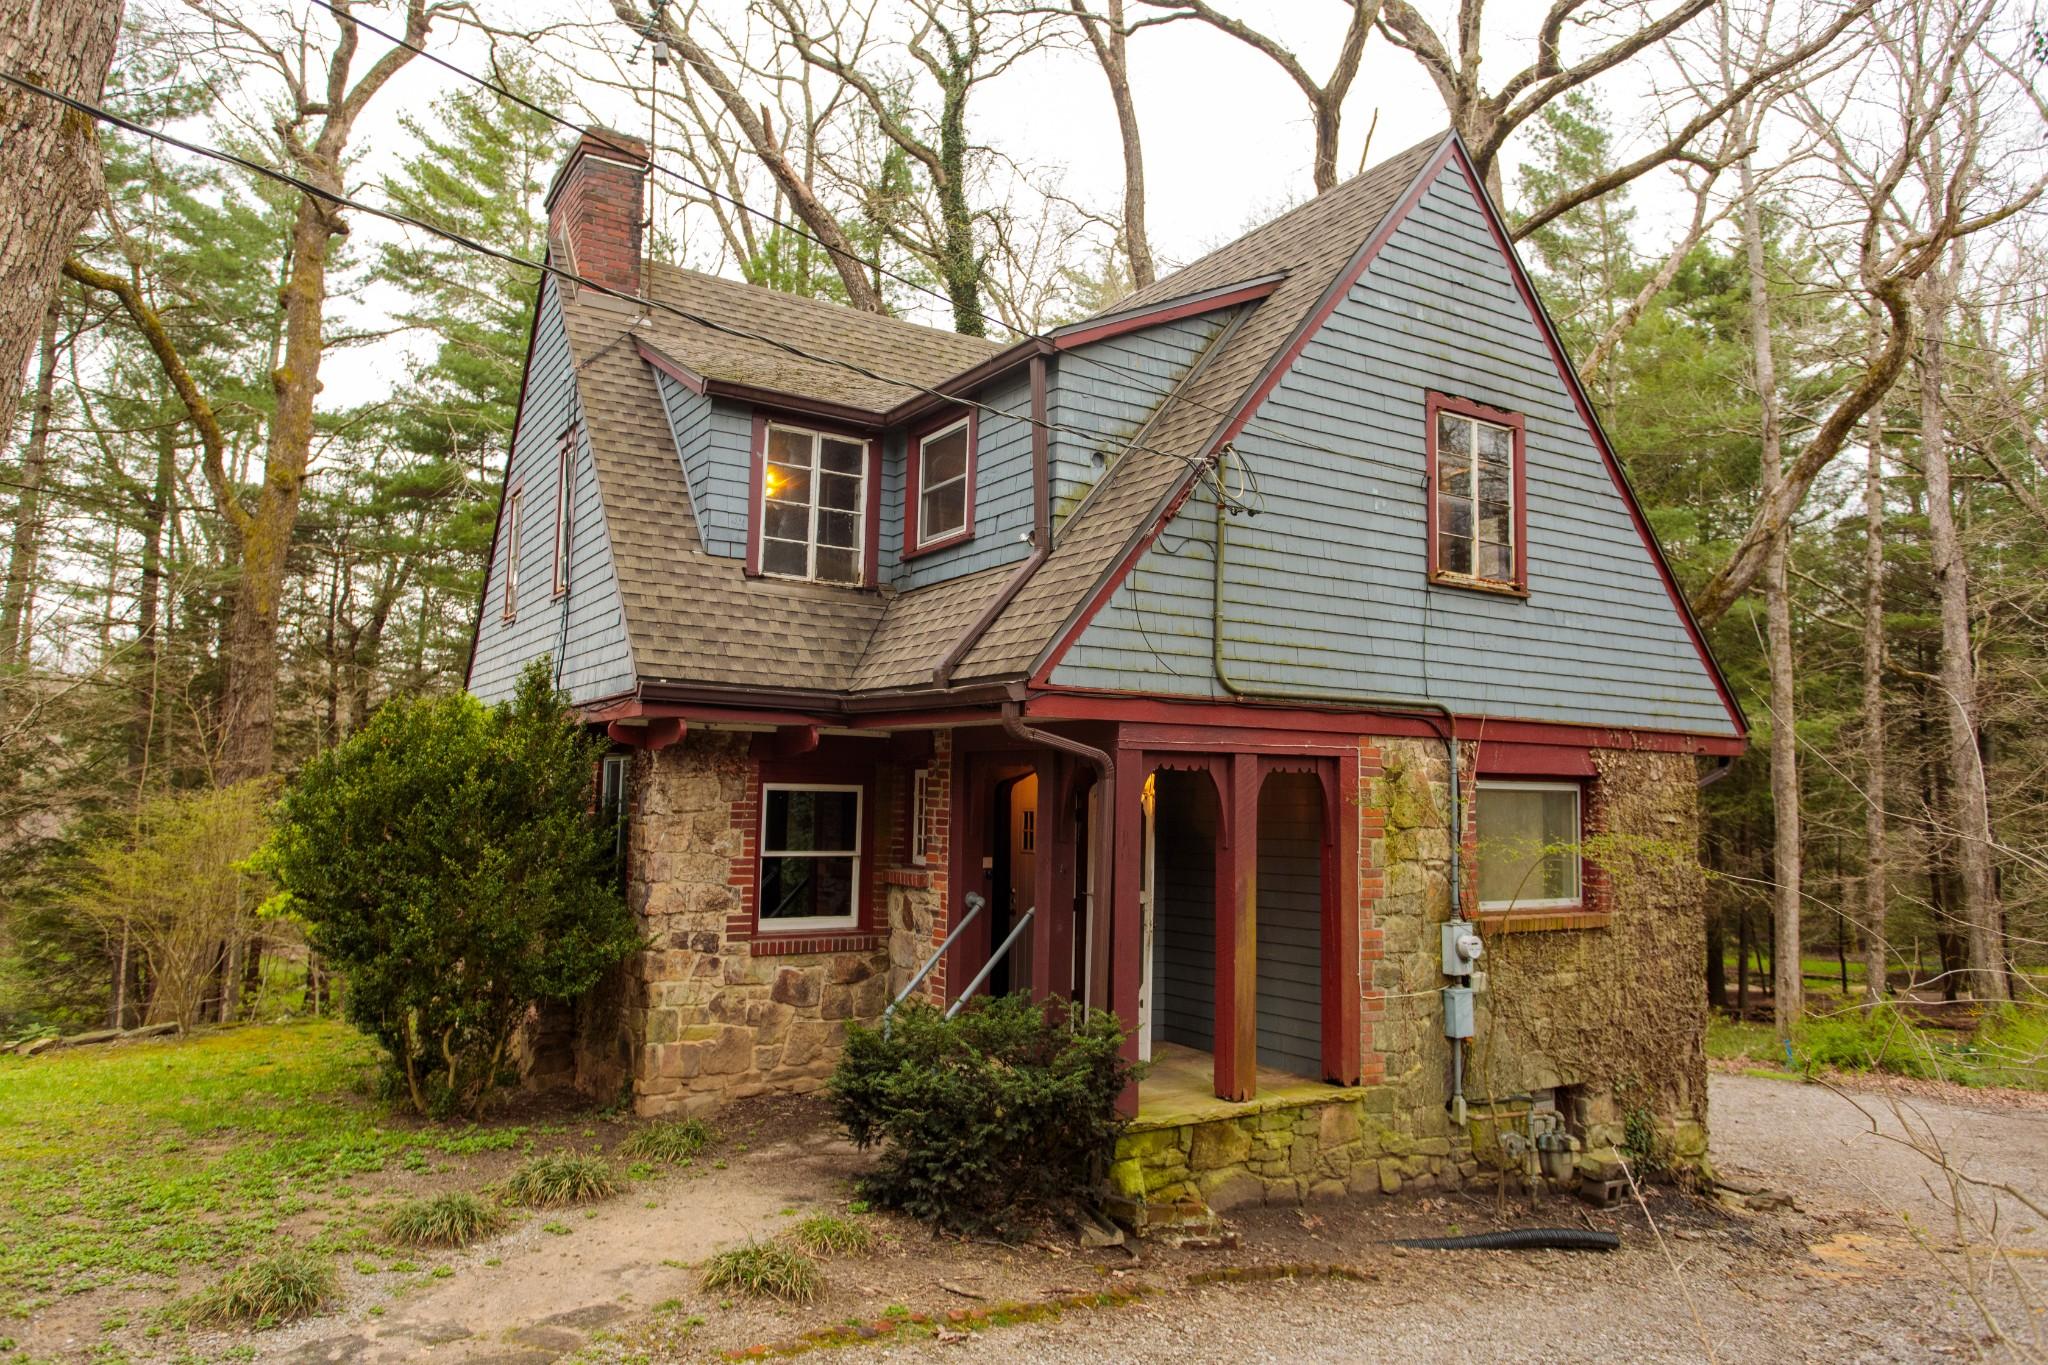 188 South Carolina Ave Property Photo - Sewanee, TN real estate listing